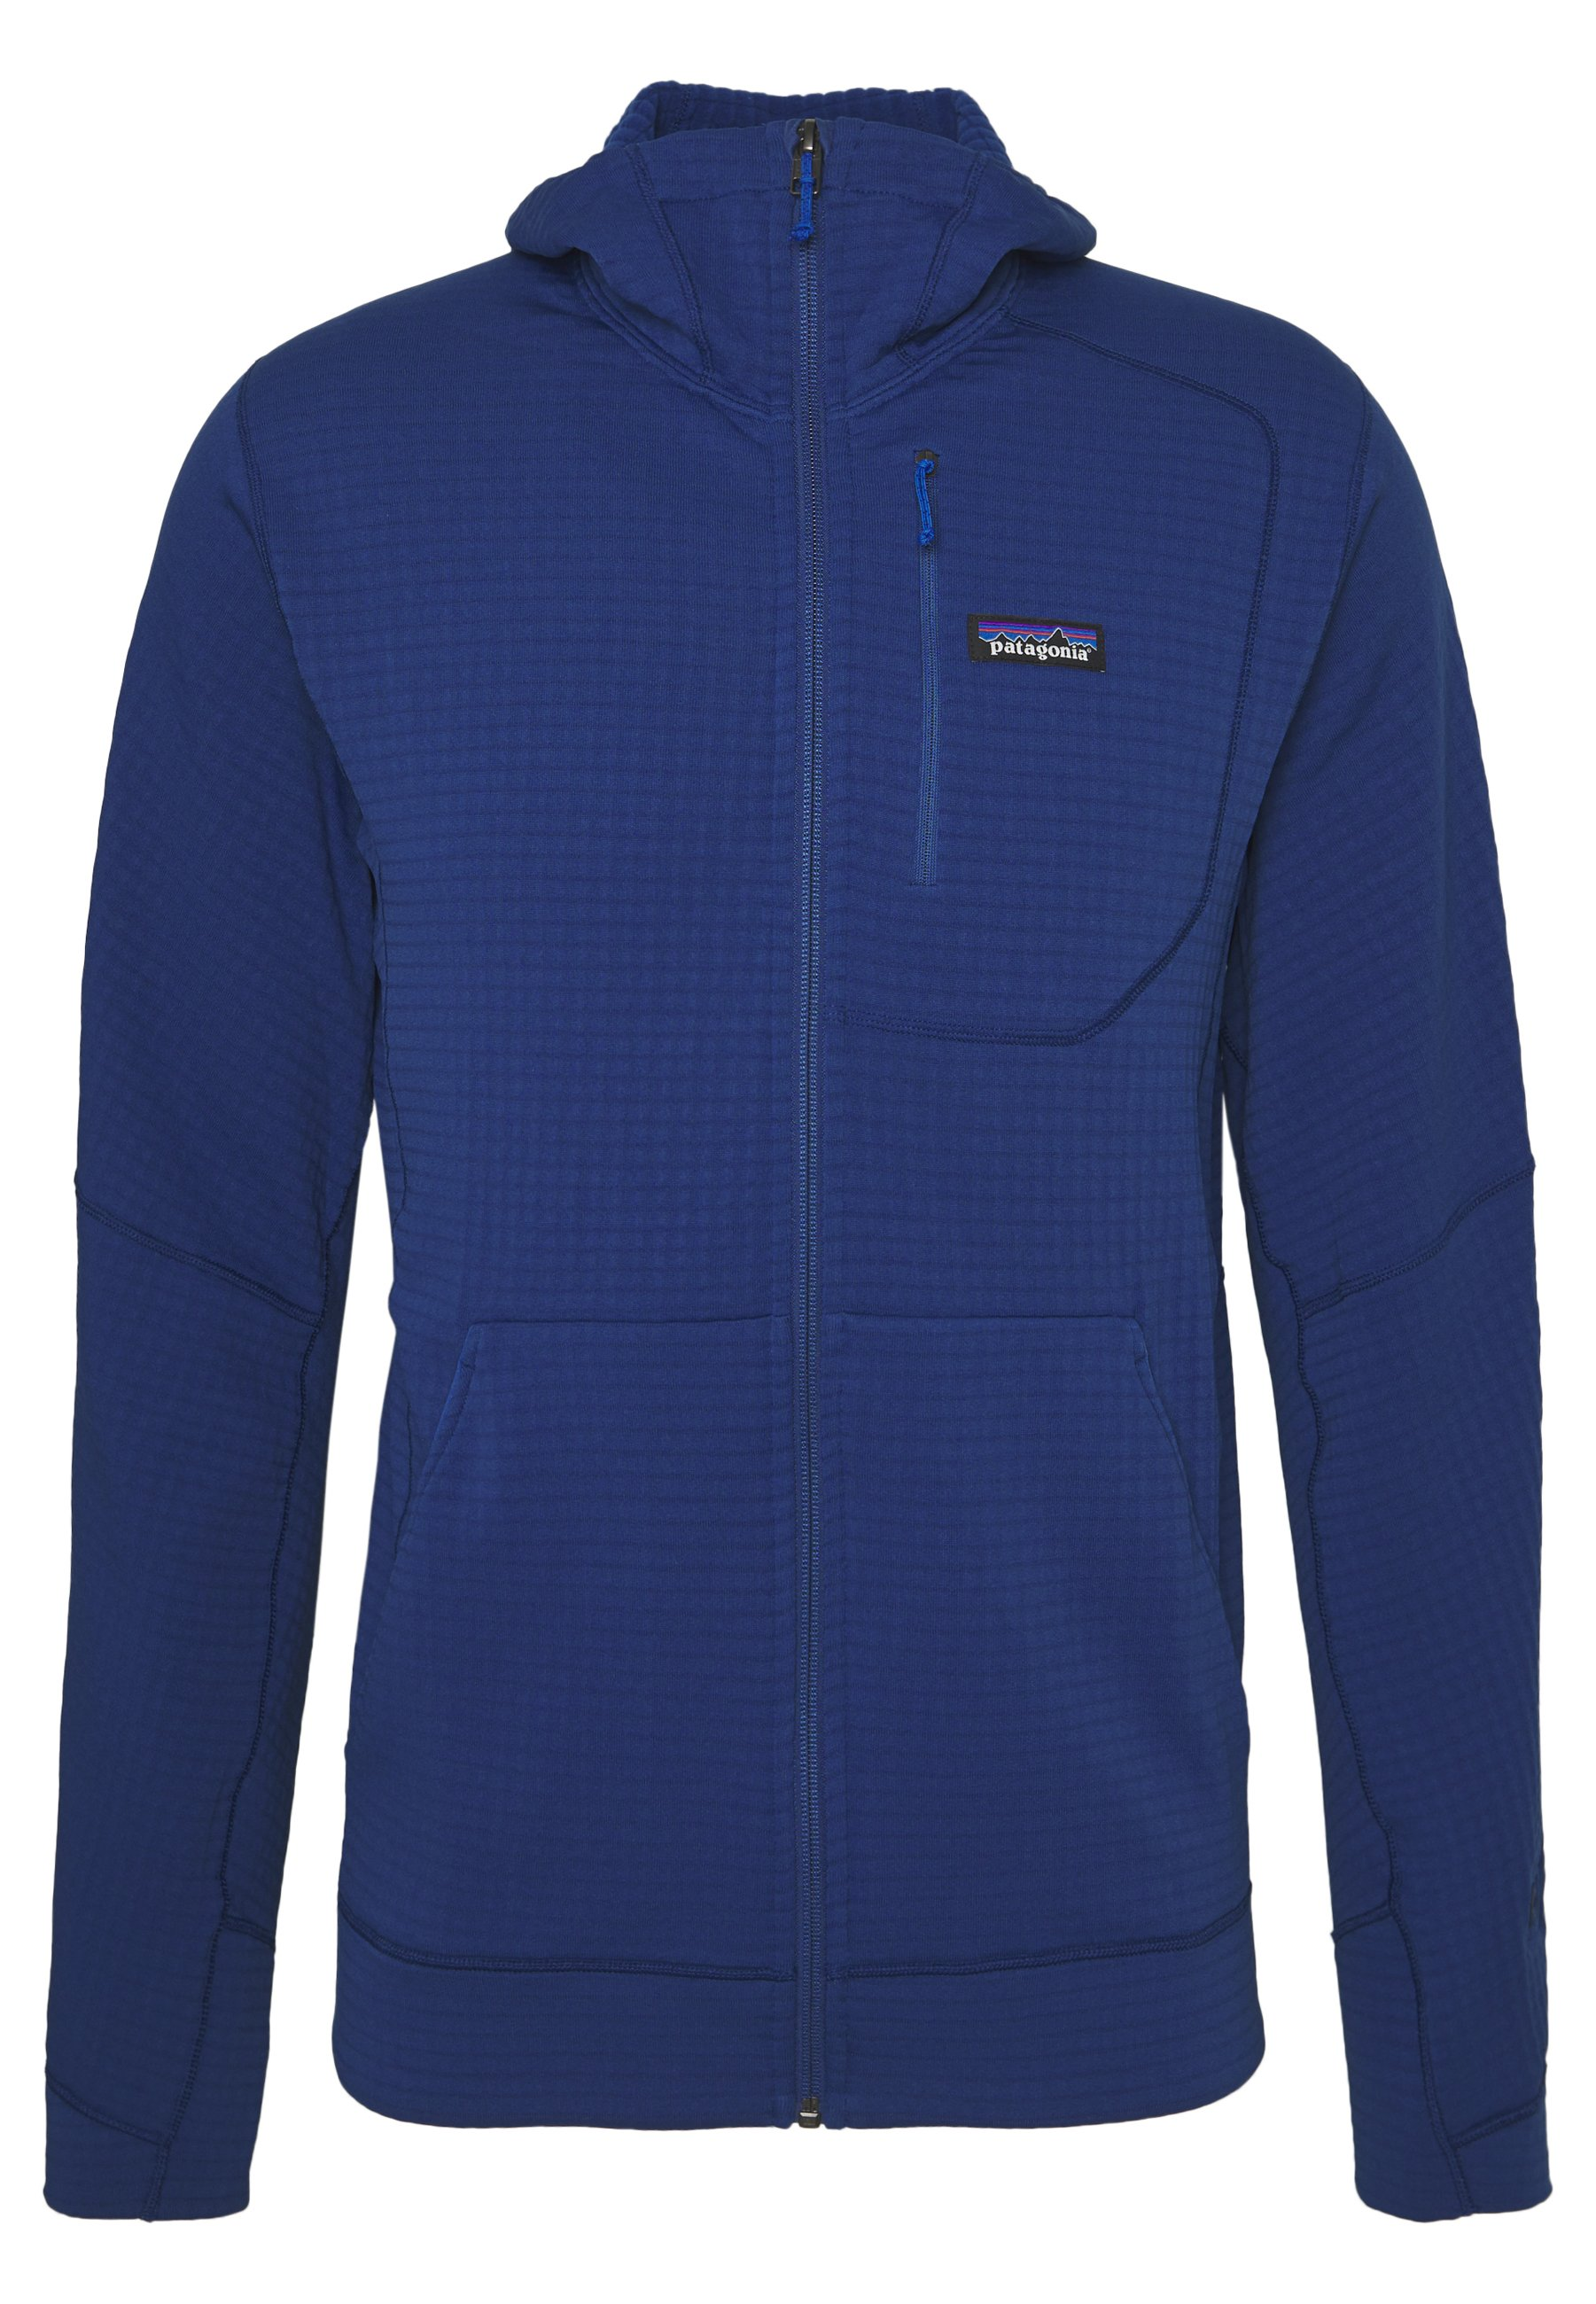 Patagonia Hoody - Veste Polaire Superior Blue f7lQxKU